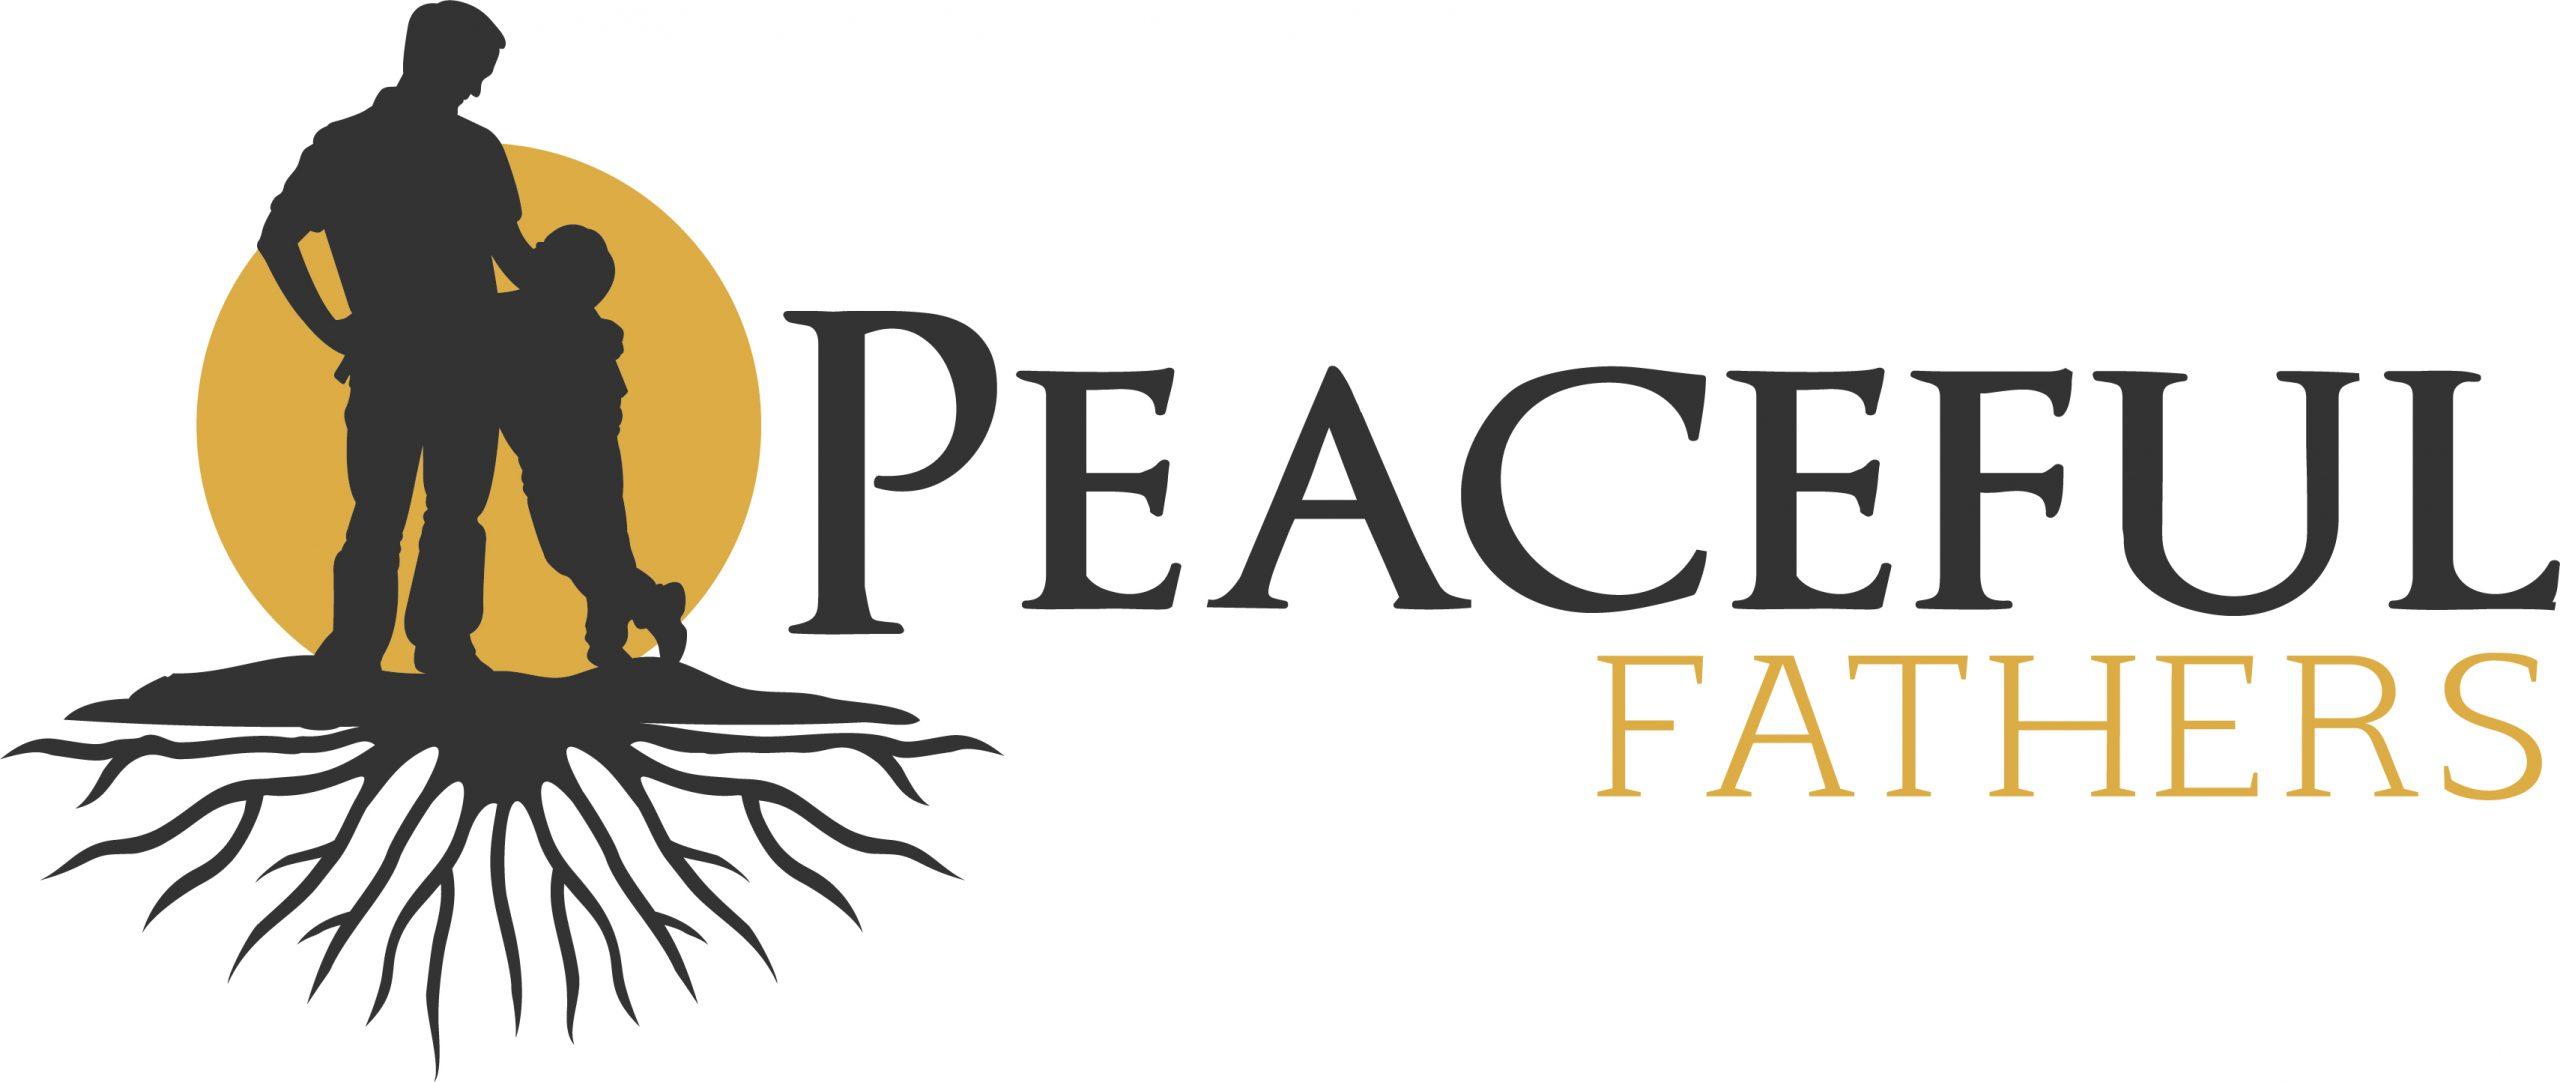 Peaceful Fathers